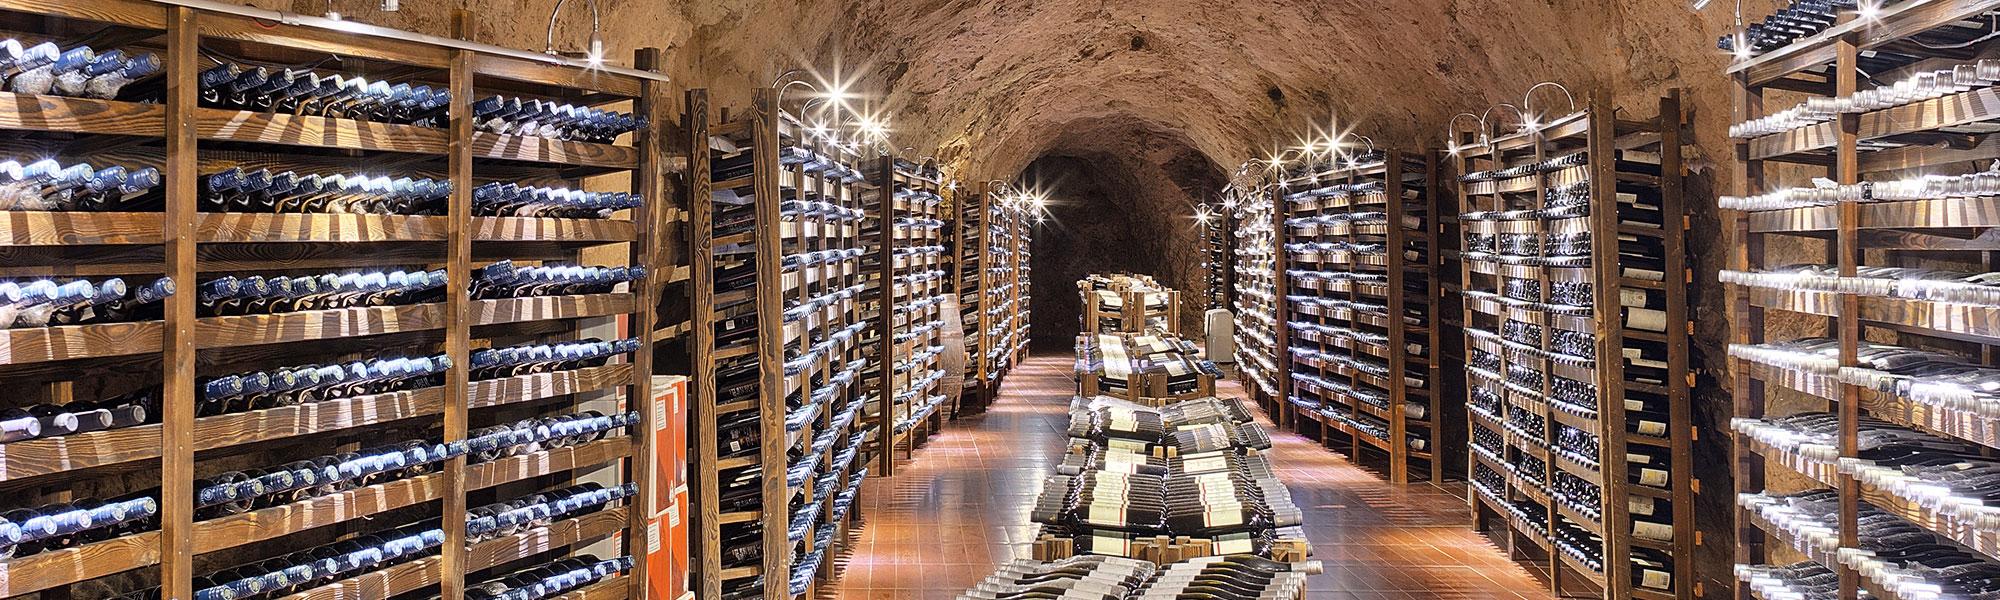 Wine cellar hallway